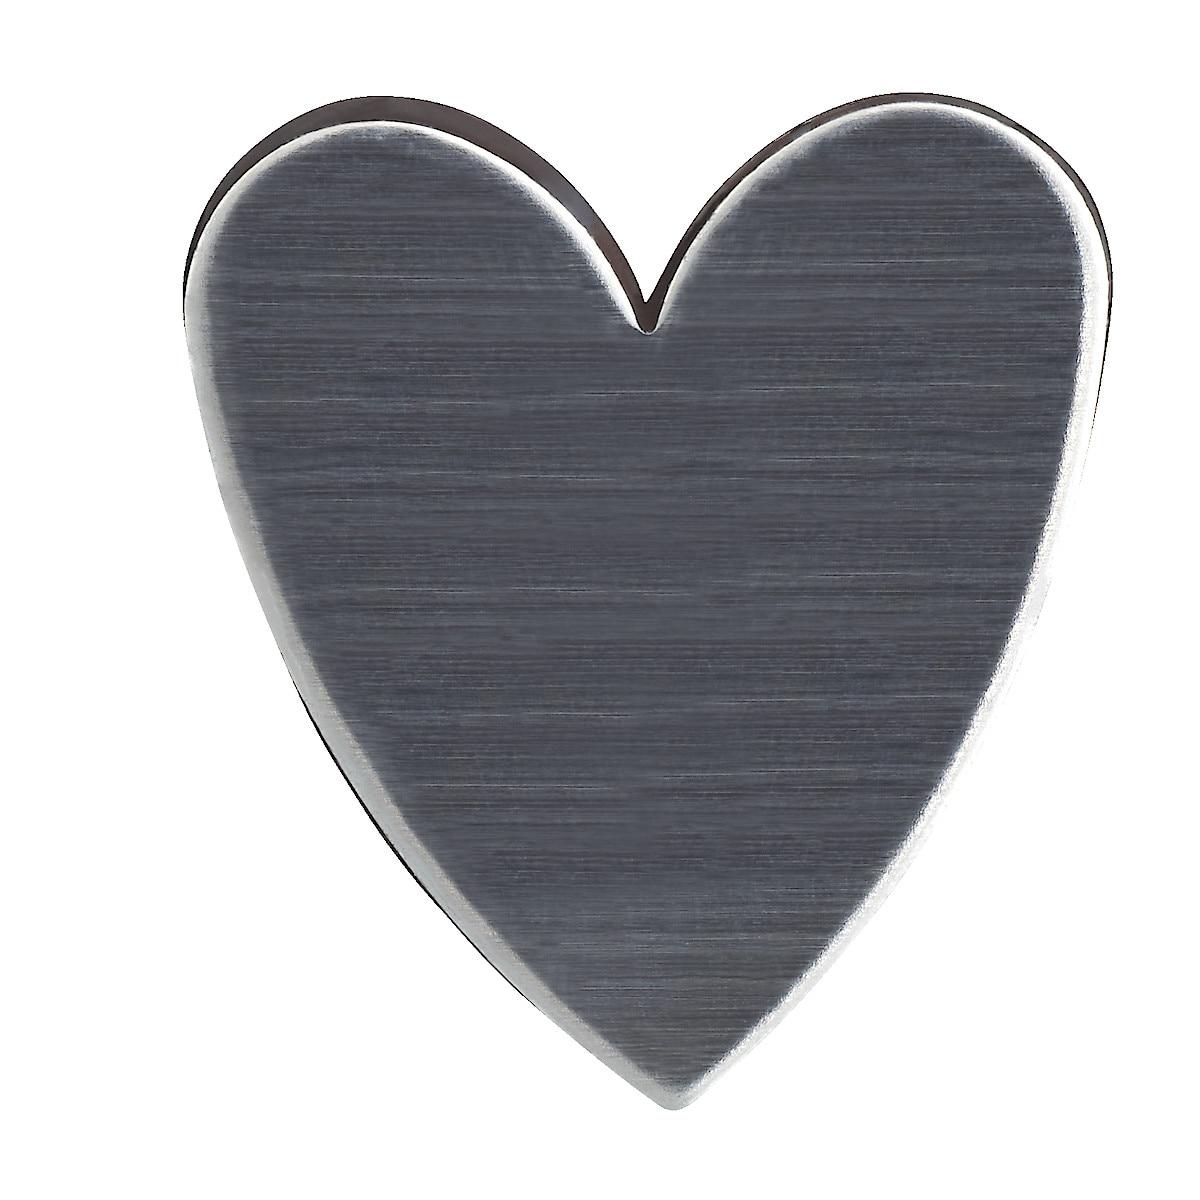 Hushållsmagnet hjärta/kryss